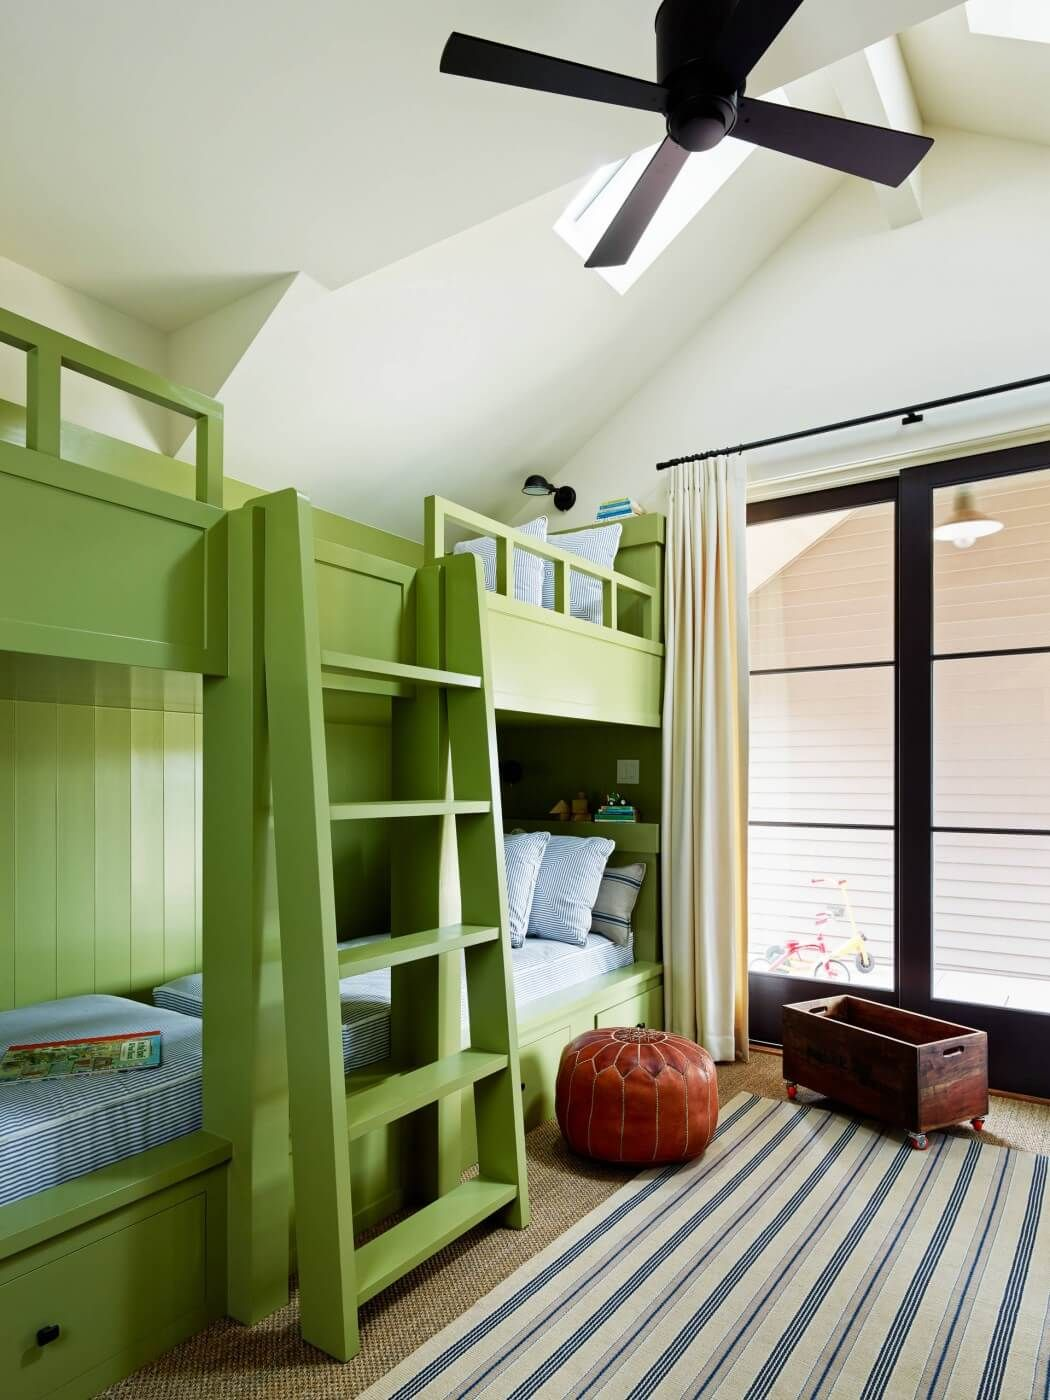 Built in loft bed ideas  Laguna de Santa Rosa by Wade Design Architects  Design architect